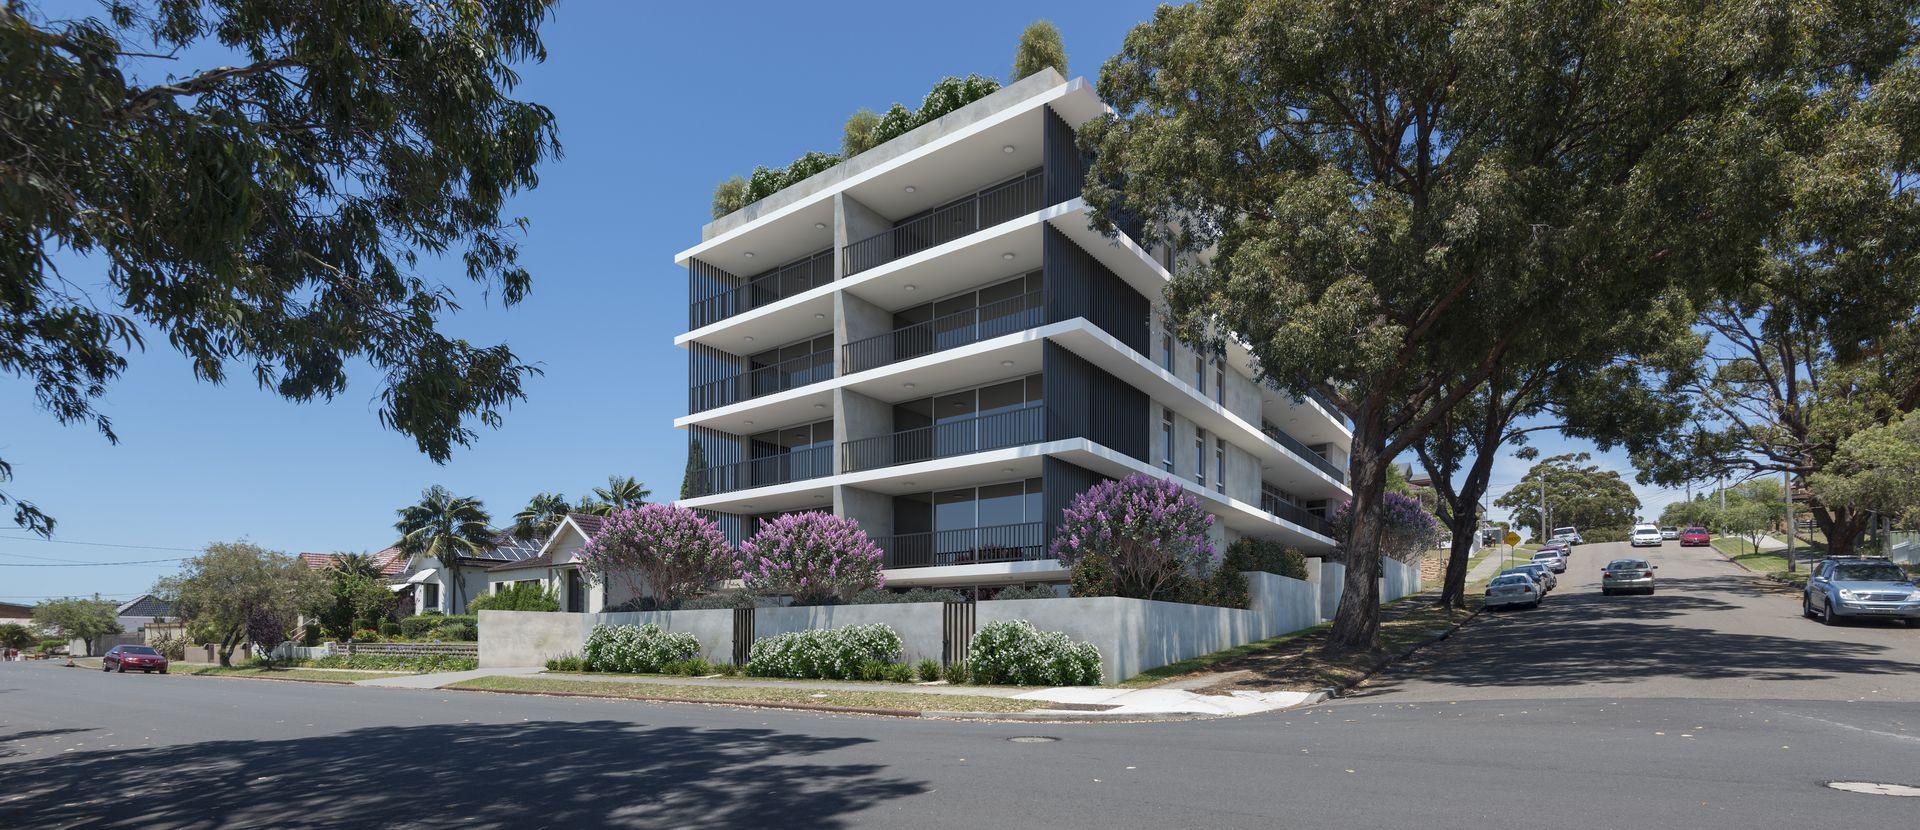 27-29 Andover Street, Carlton NSW 2218, Image 0